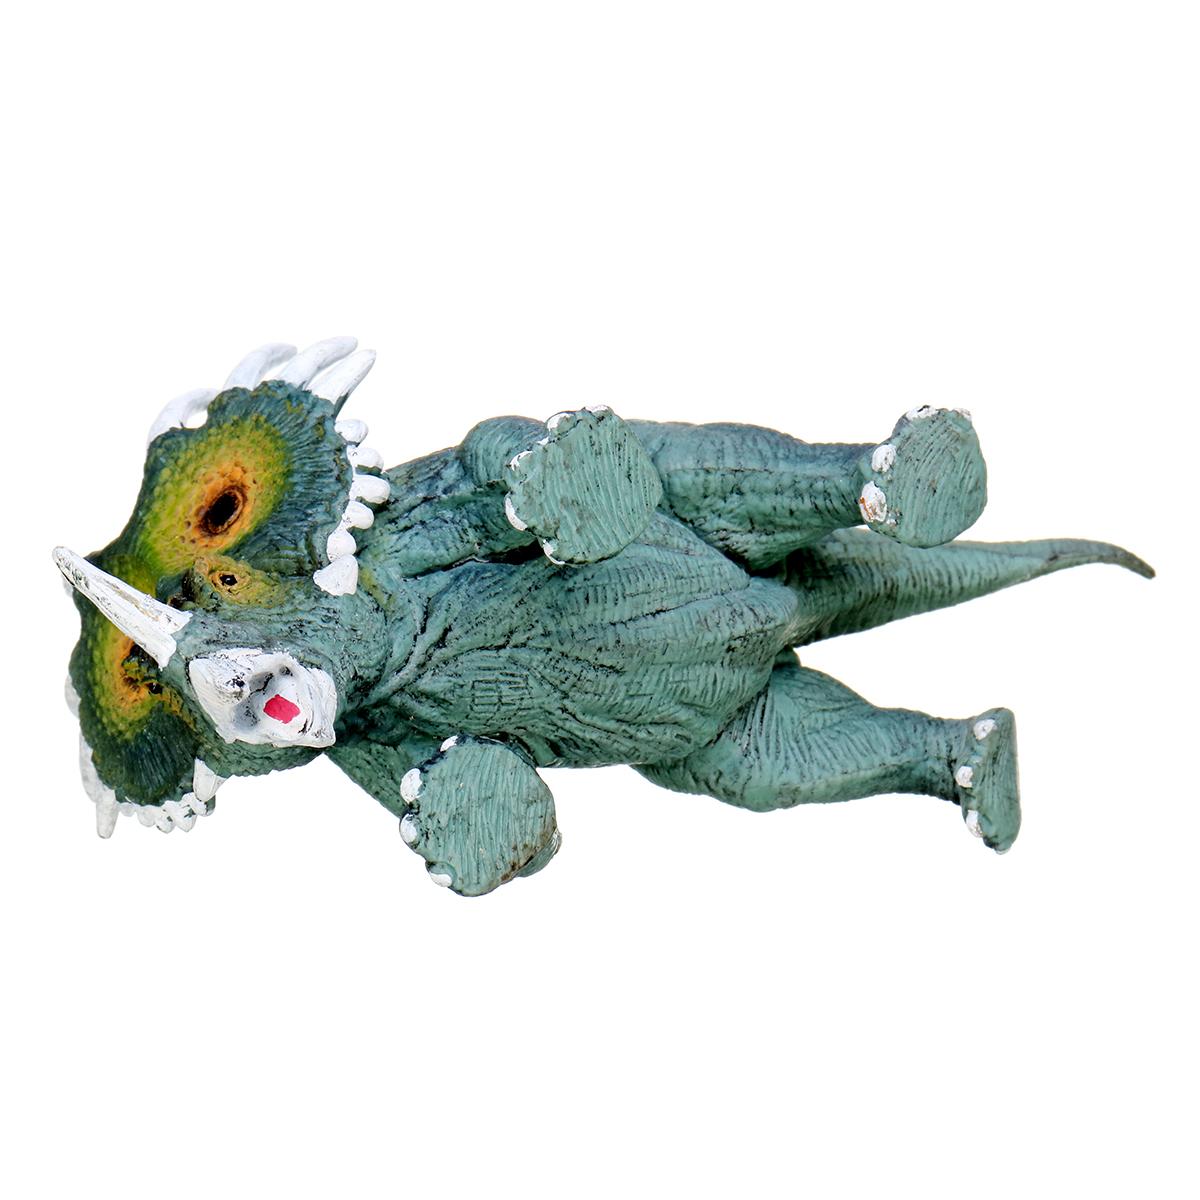 Dinosaur Toy Styracosaurus Diecast Model Kid Gift Collection Trident Dragon